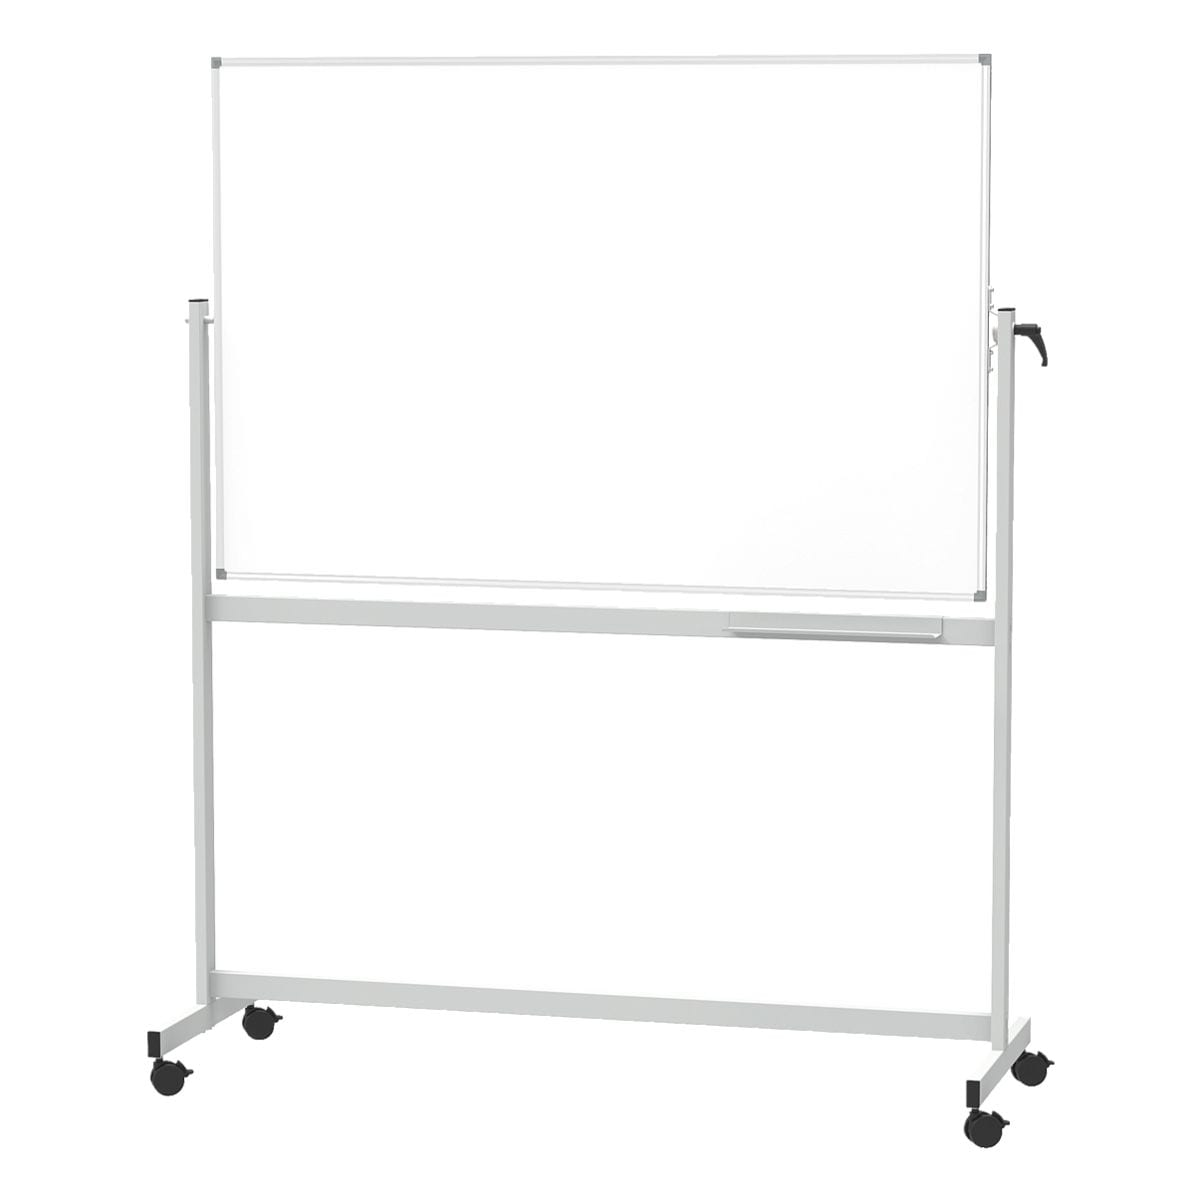 Maul Whiteboard Maul Standard 6460384 emailliert, 150x100 cm